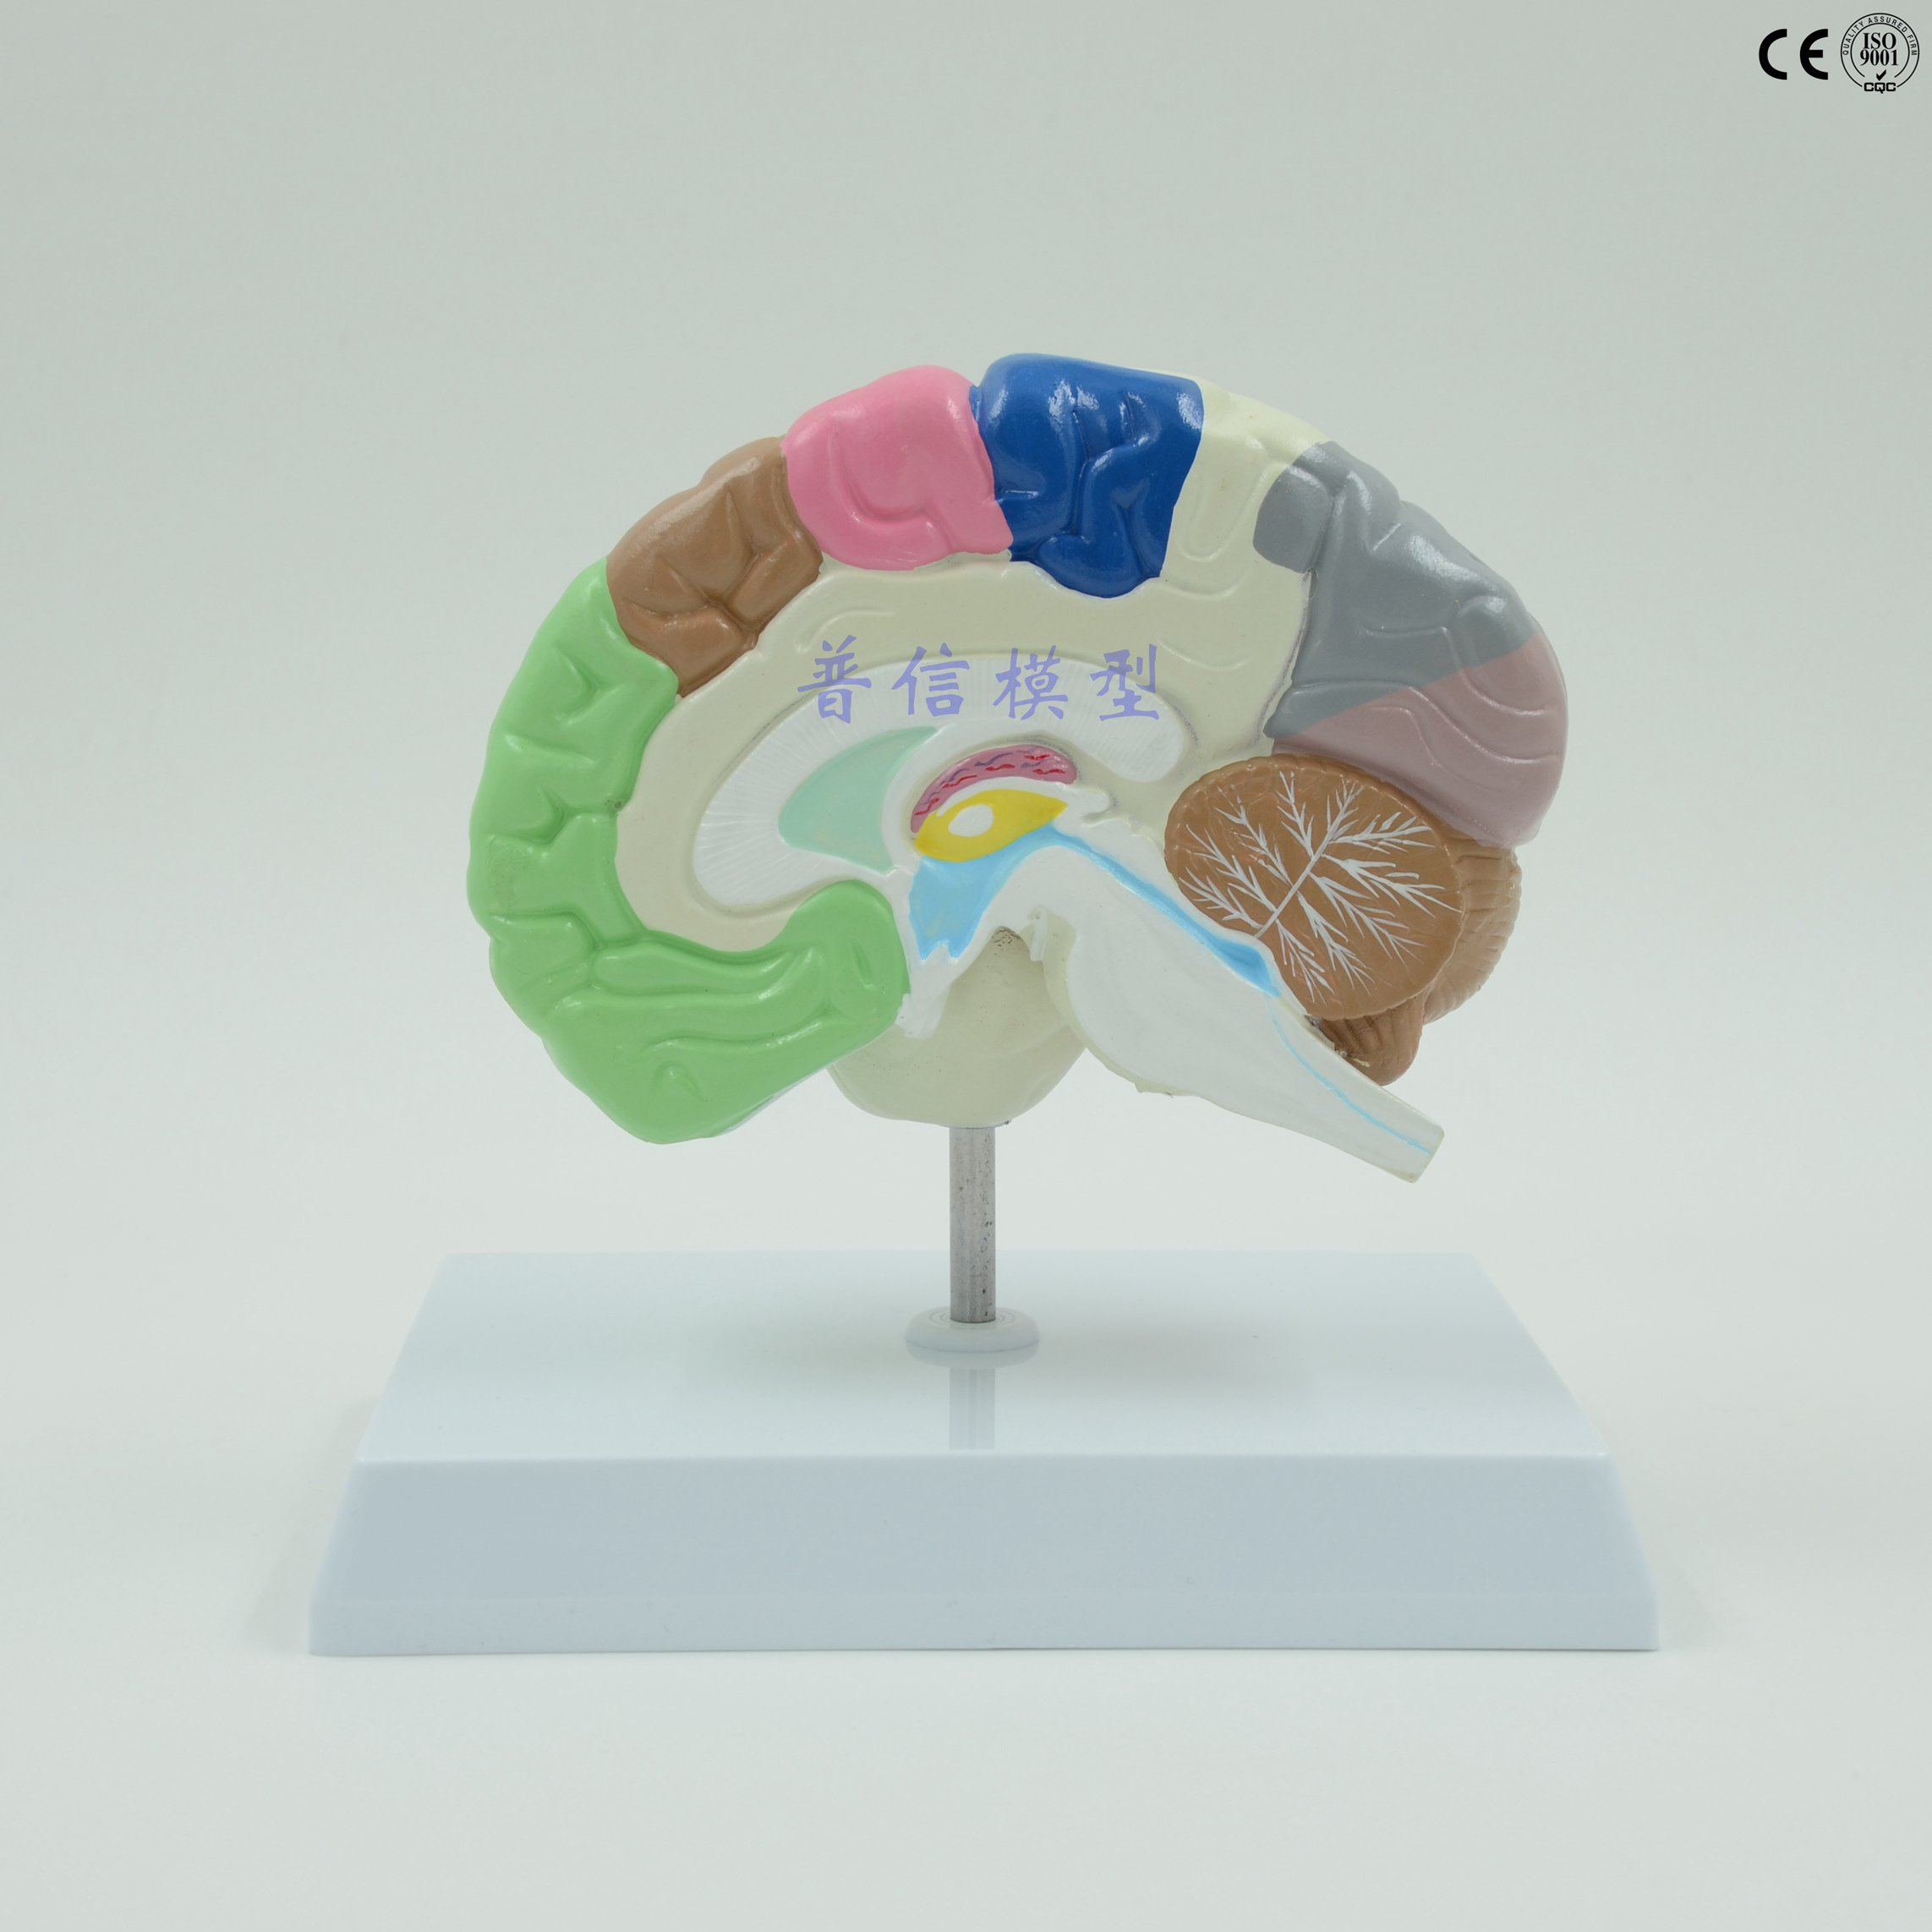 Brain modell Menschlichen rechten hemisphäre funktionsbereich modell ...